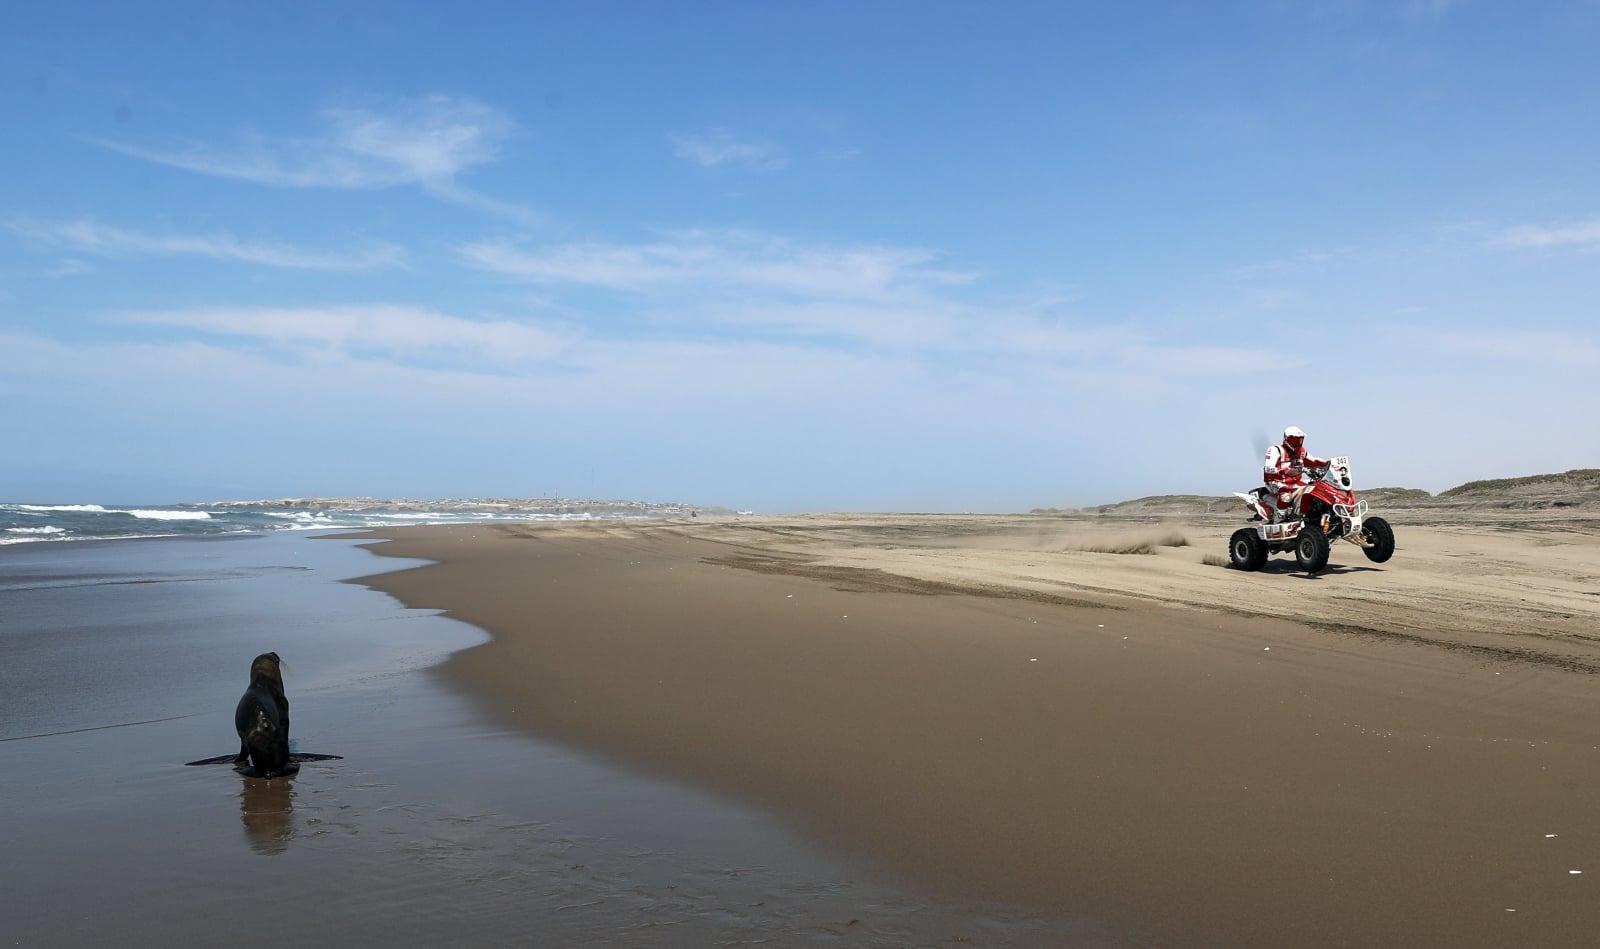 Rafał Sonik podczas piątego etapu Rajdu Dakar 2018 na plaży  Puerto Lomas w Peru, fot.EPA/DAVID FERNANDEZ